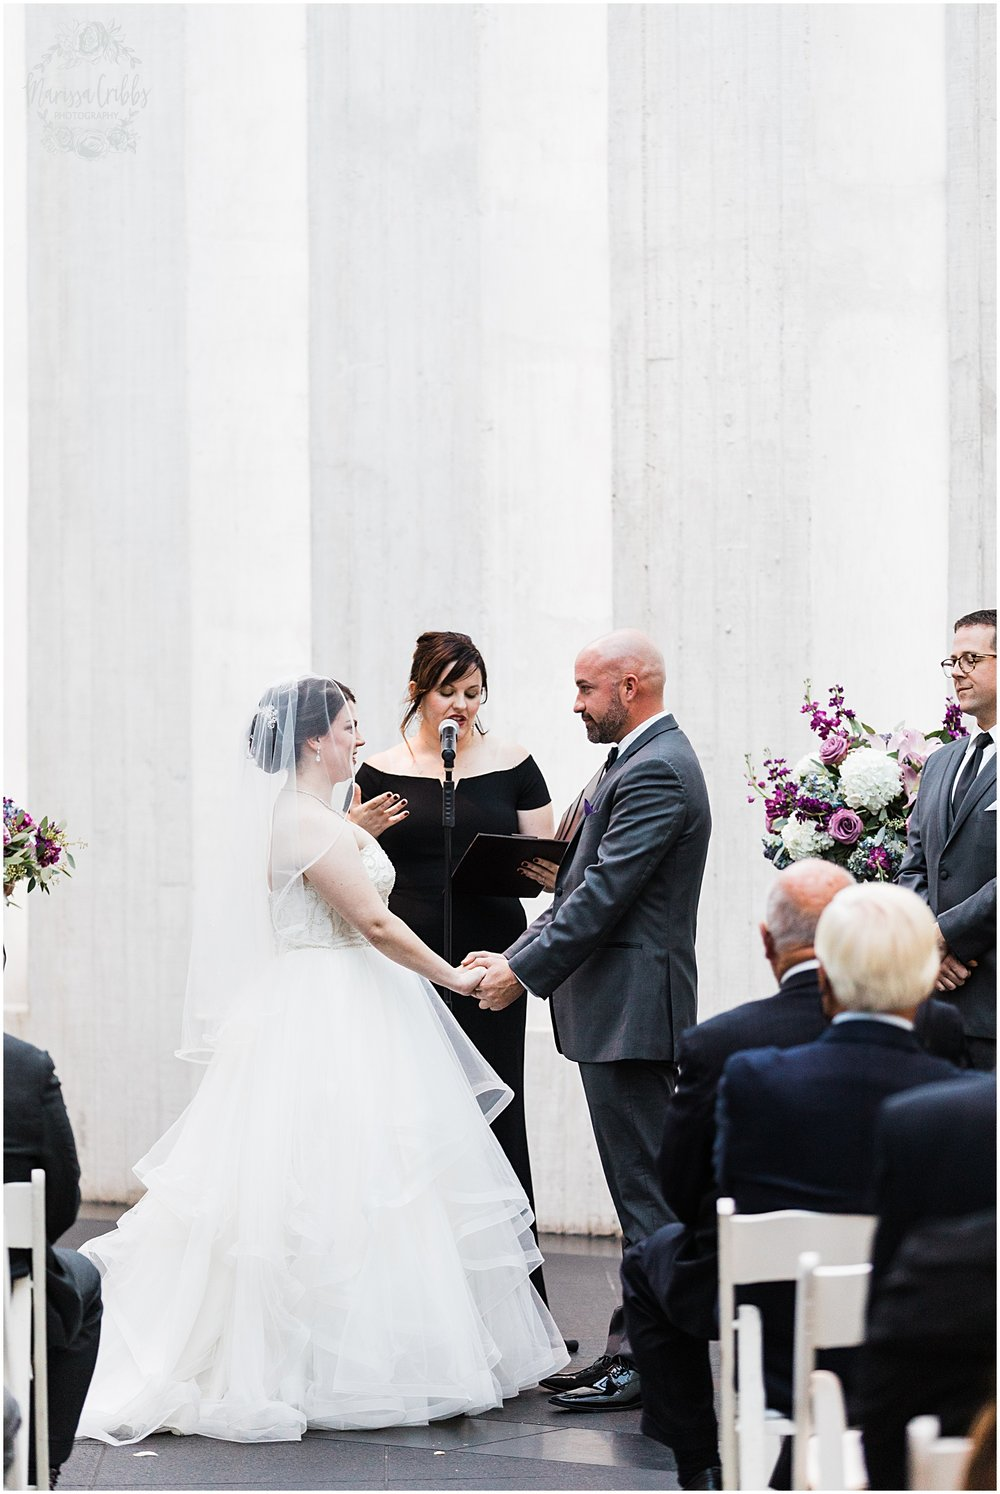 LAURA & DAN MARRIED | NELSON ATKINS MUSEUM | MARISSA CRIBBS PHOTOGRAPHY_7018.jpg